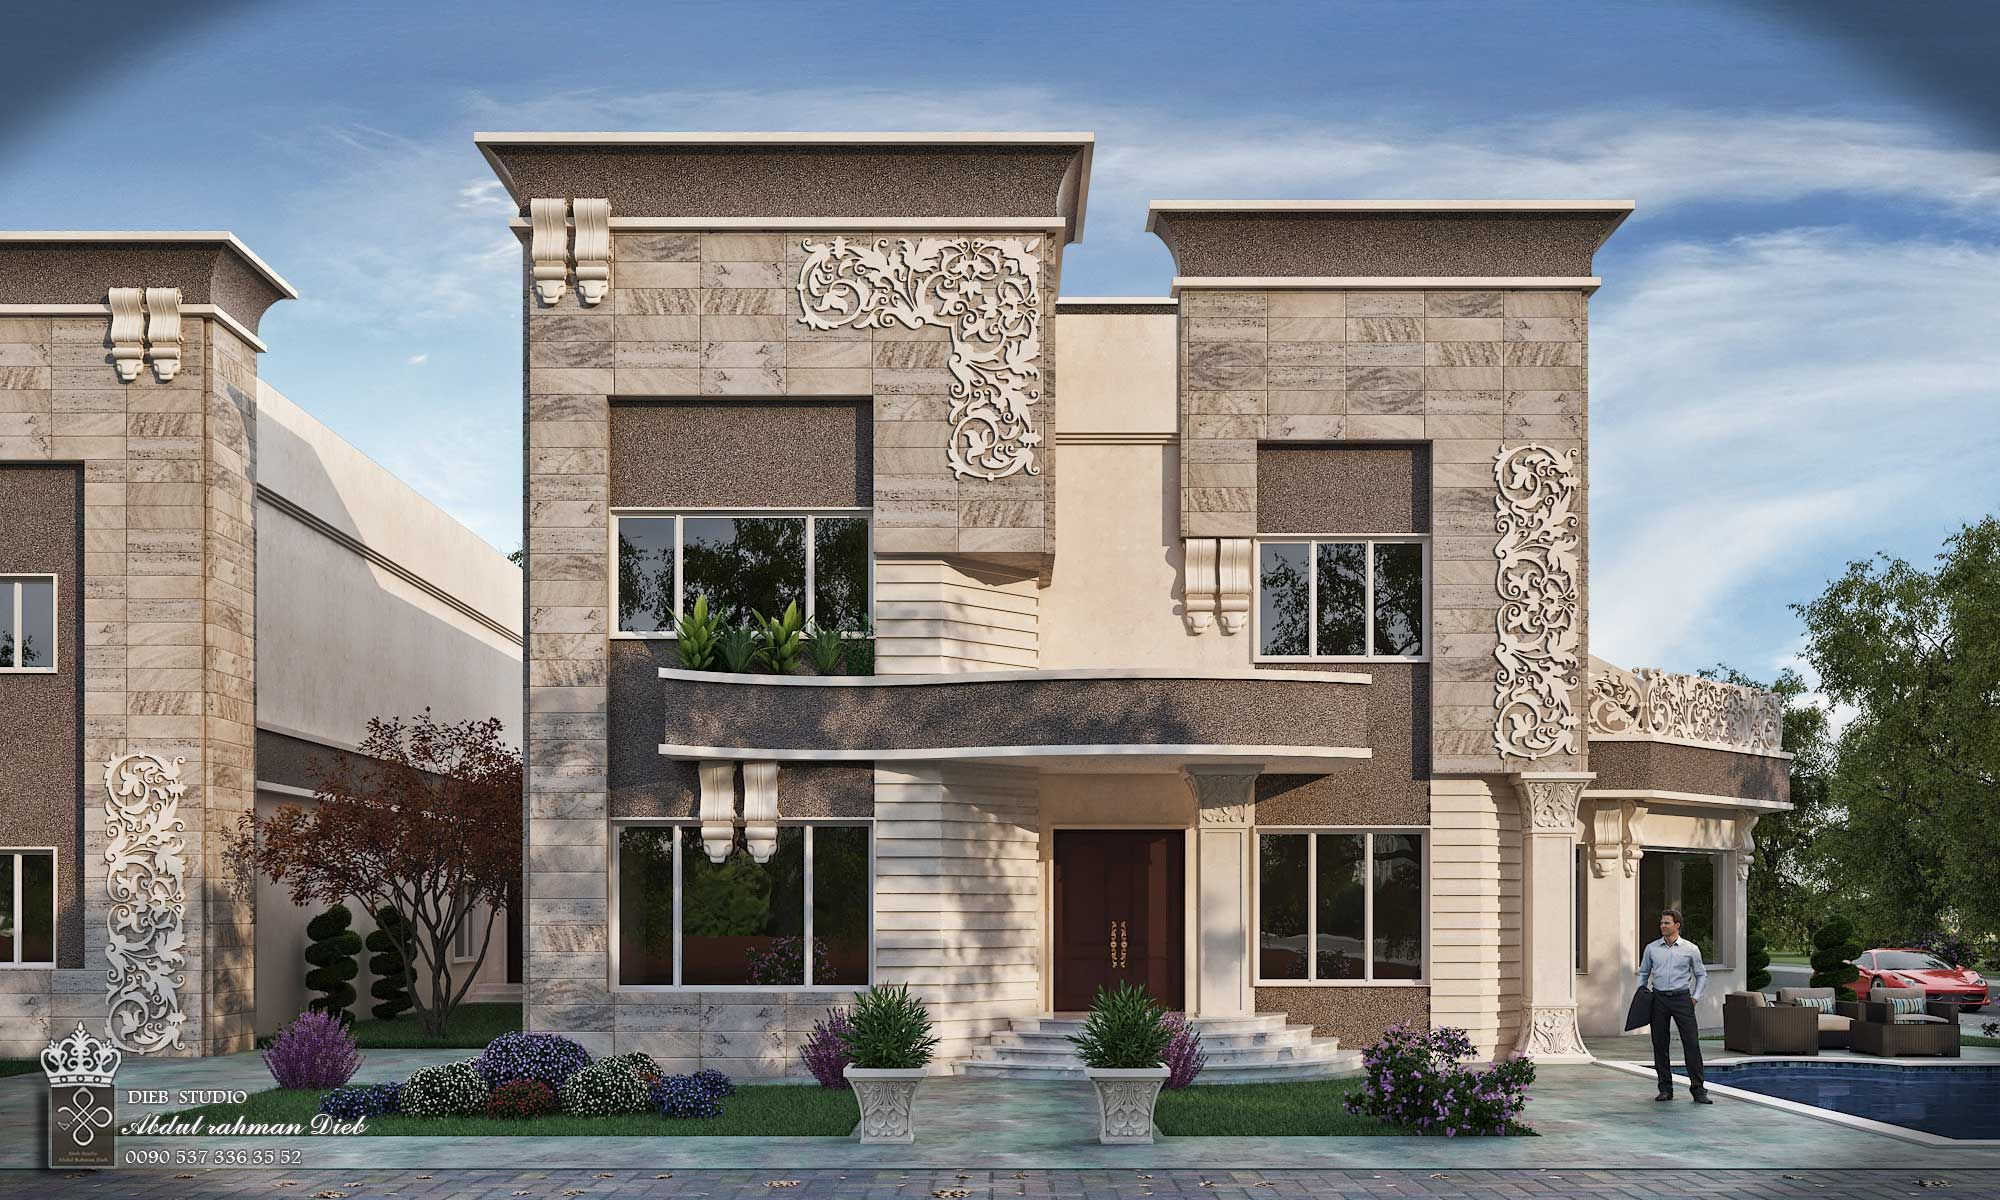 Andalusian Private Villas Complex Ksa فلل اندلسي اسلامي ديكور خارجي Luxury Exterior Design Classic House Exterior Modern Exterior House Designs